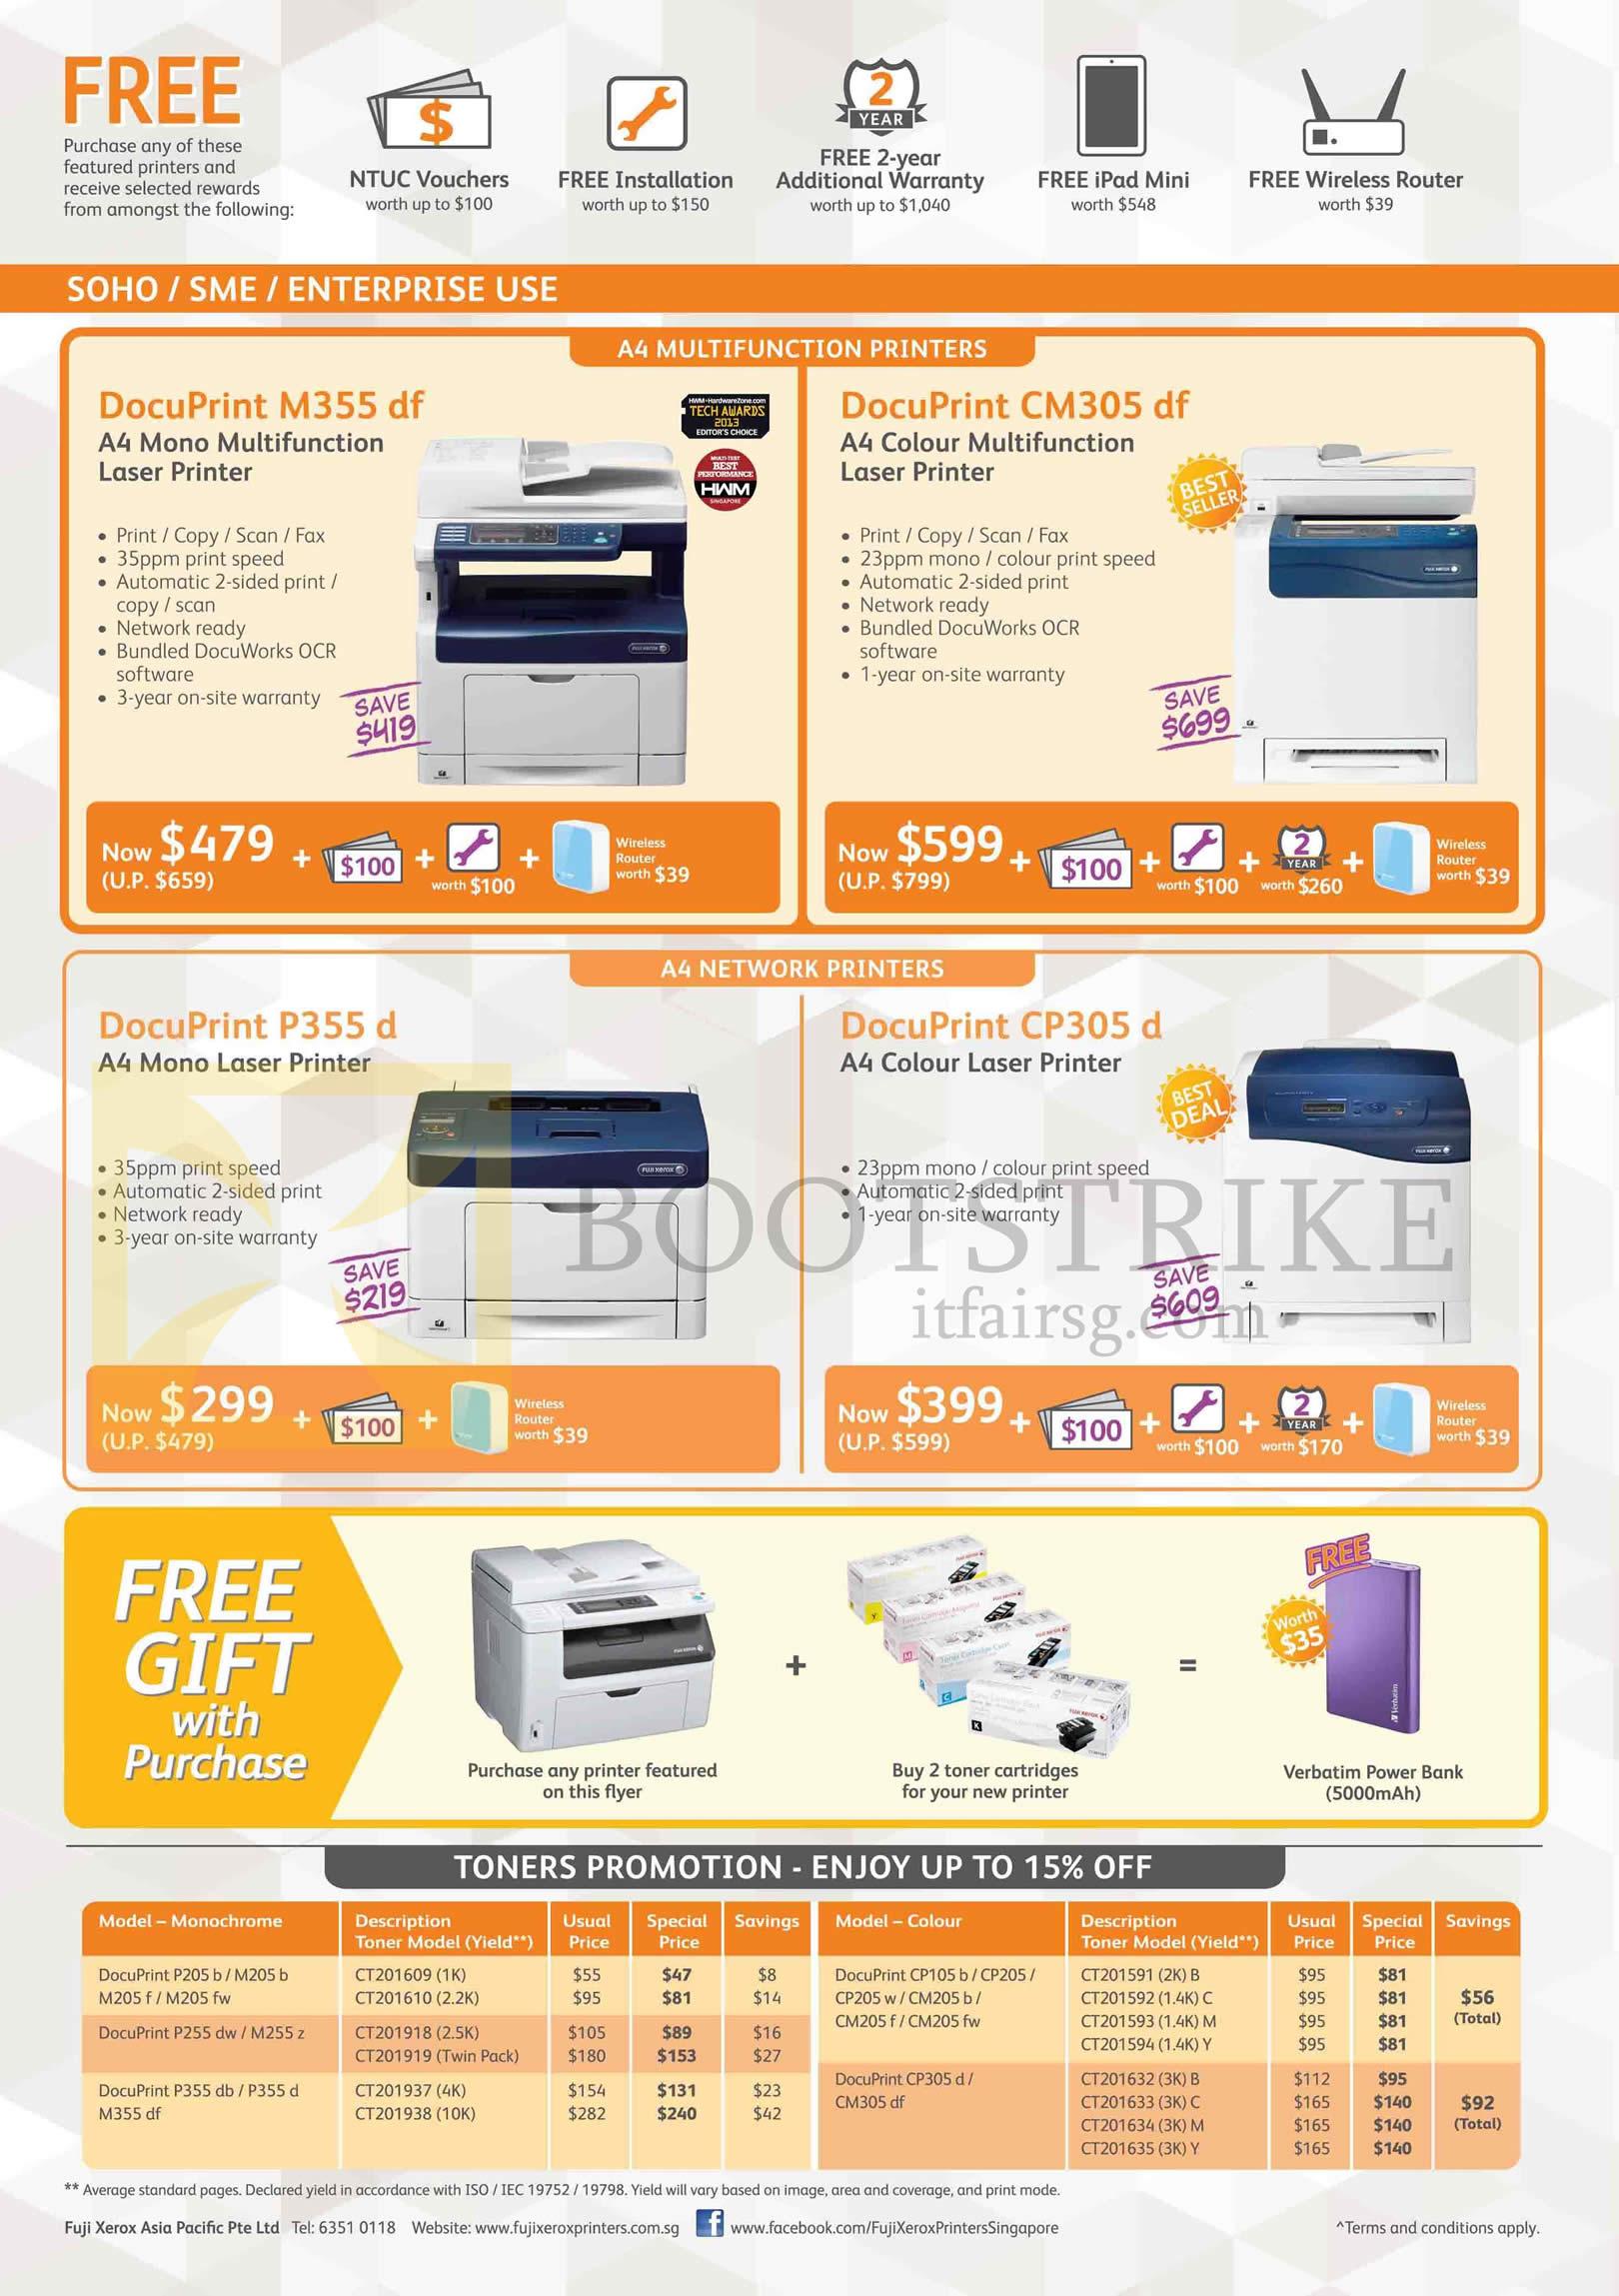 Fuji Xerox Printers, Toners, DocuPrint M355df, CM305df, P355d